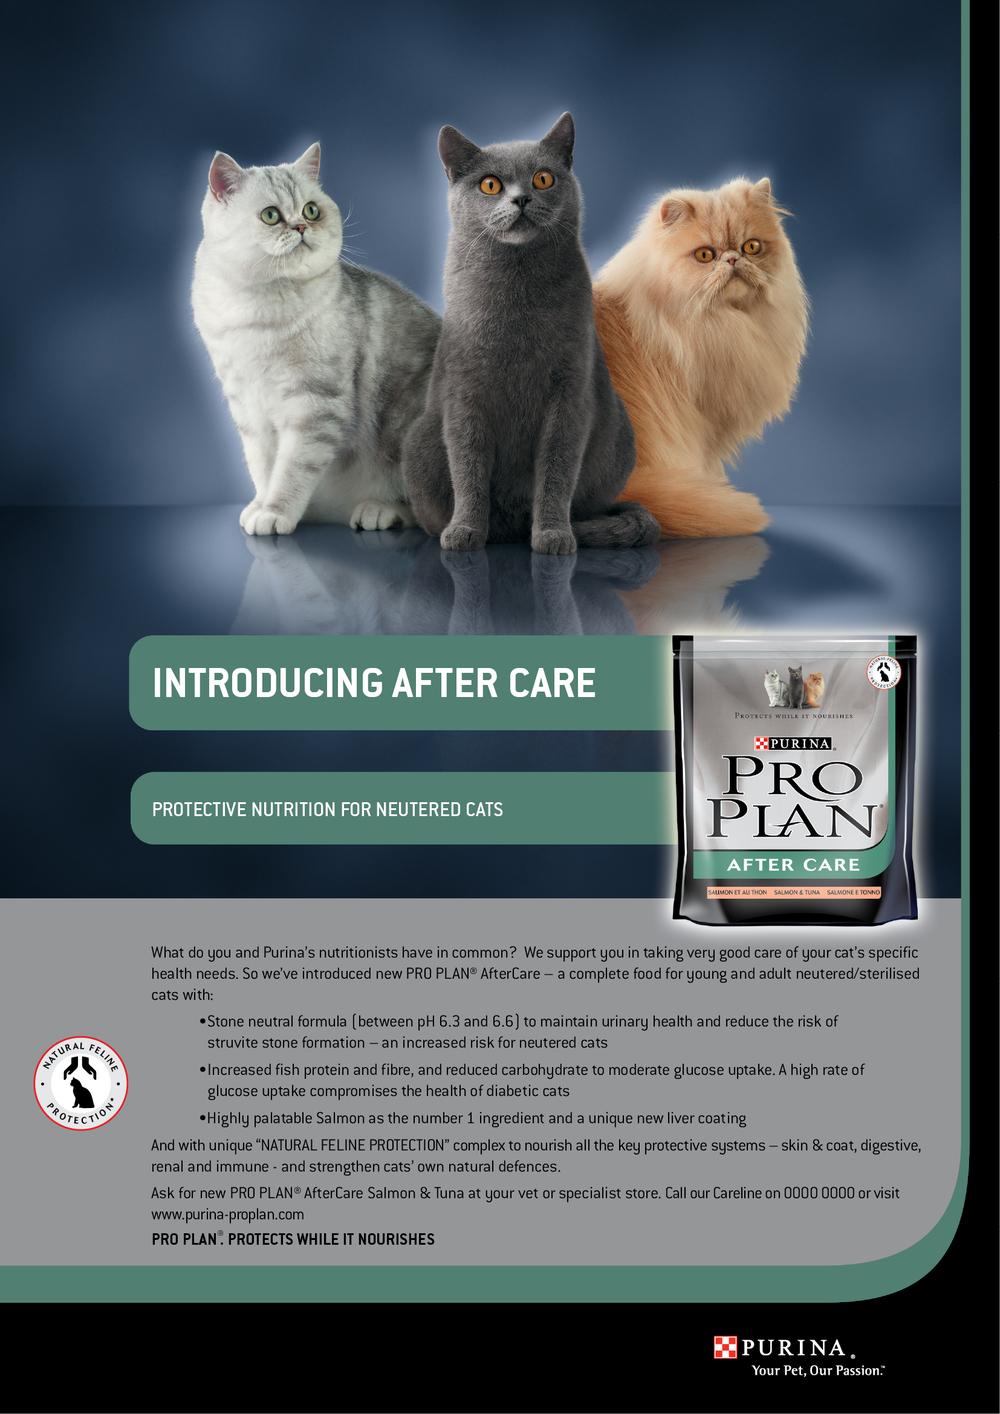 Proplan Ads2.jpg